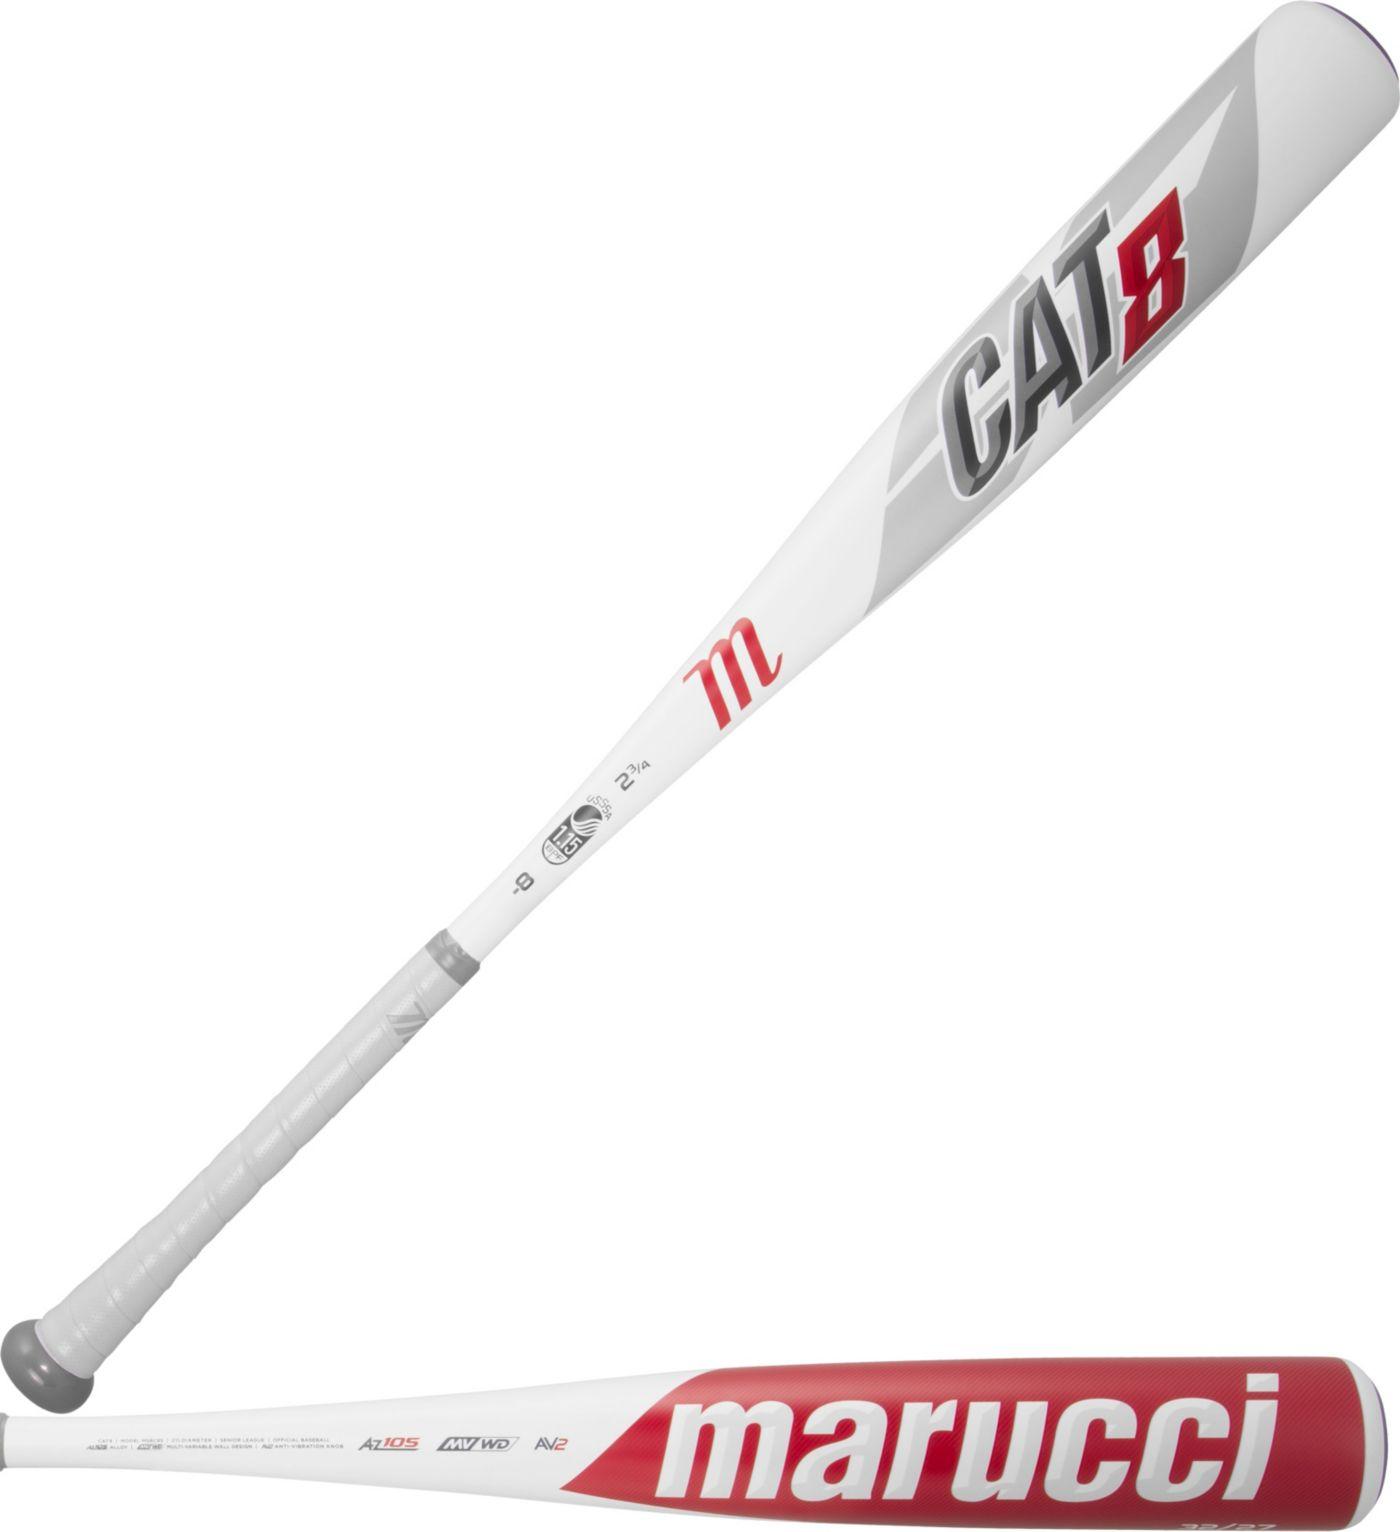 "Marucci CAT8 2¾"" USSSA Bat 2019 (-8)"